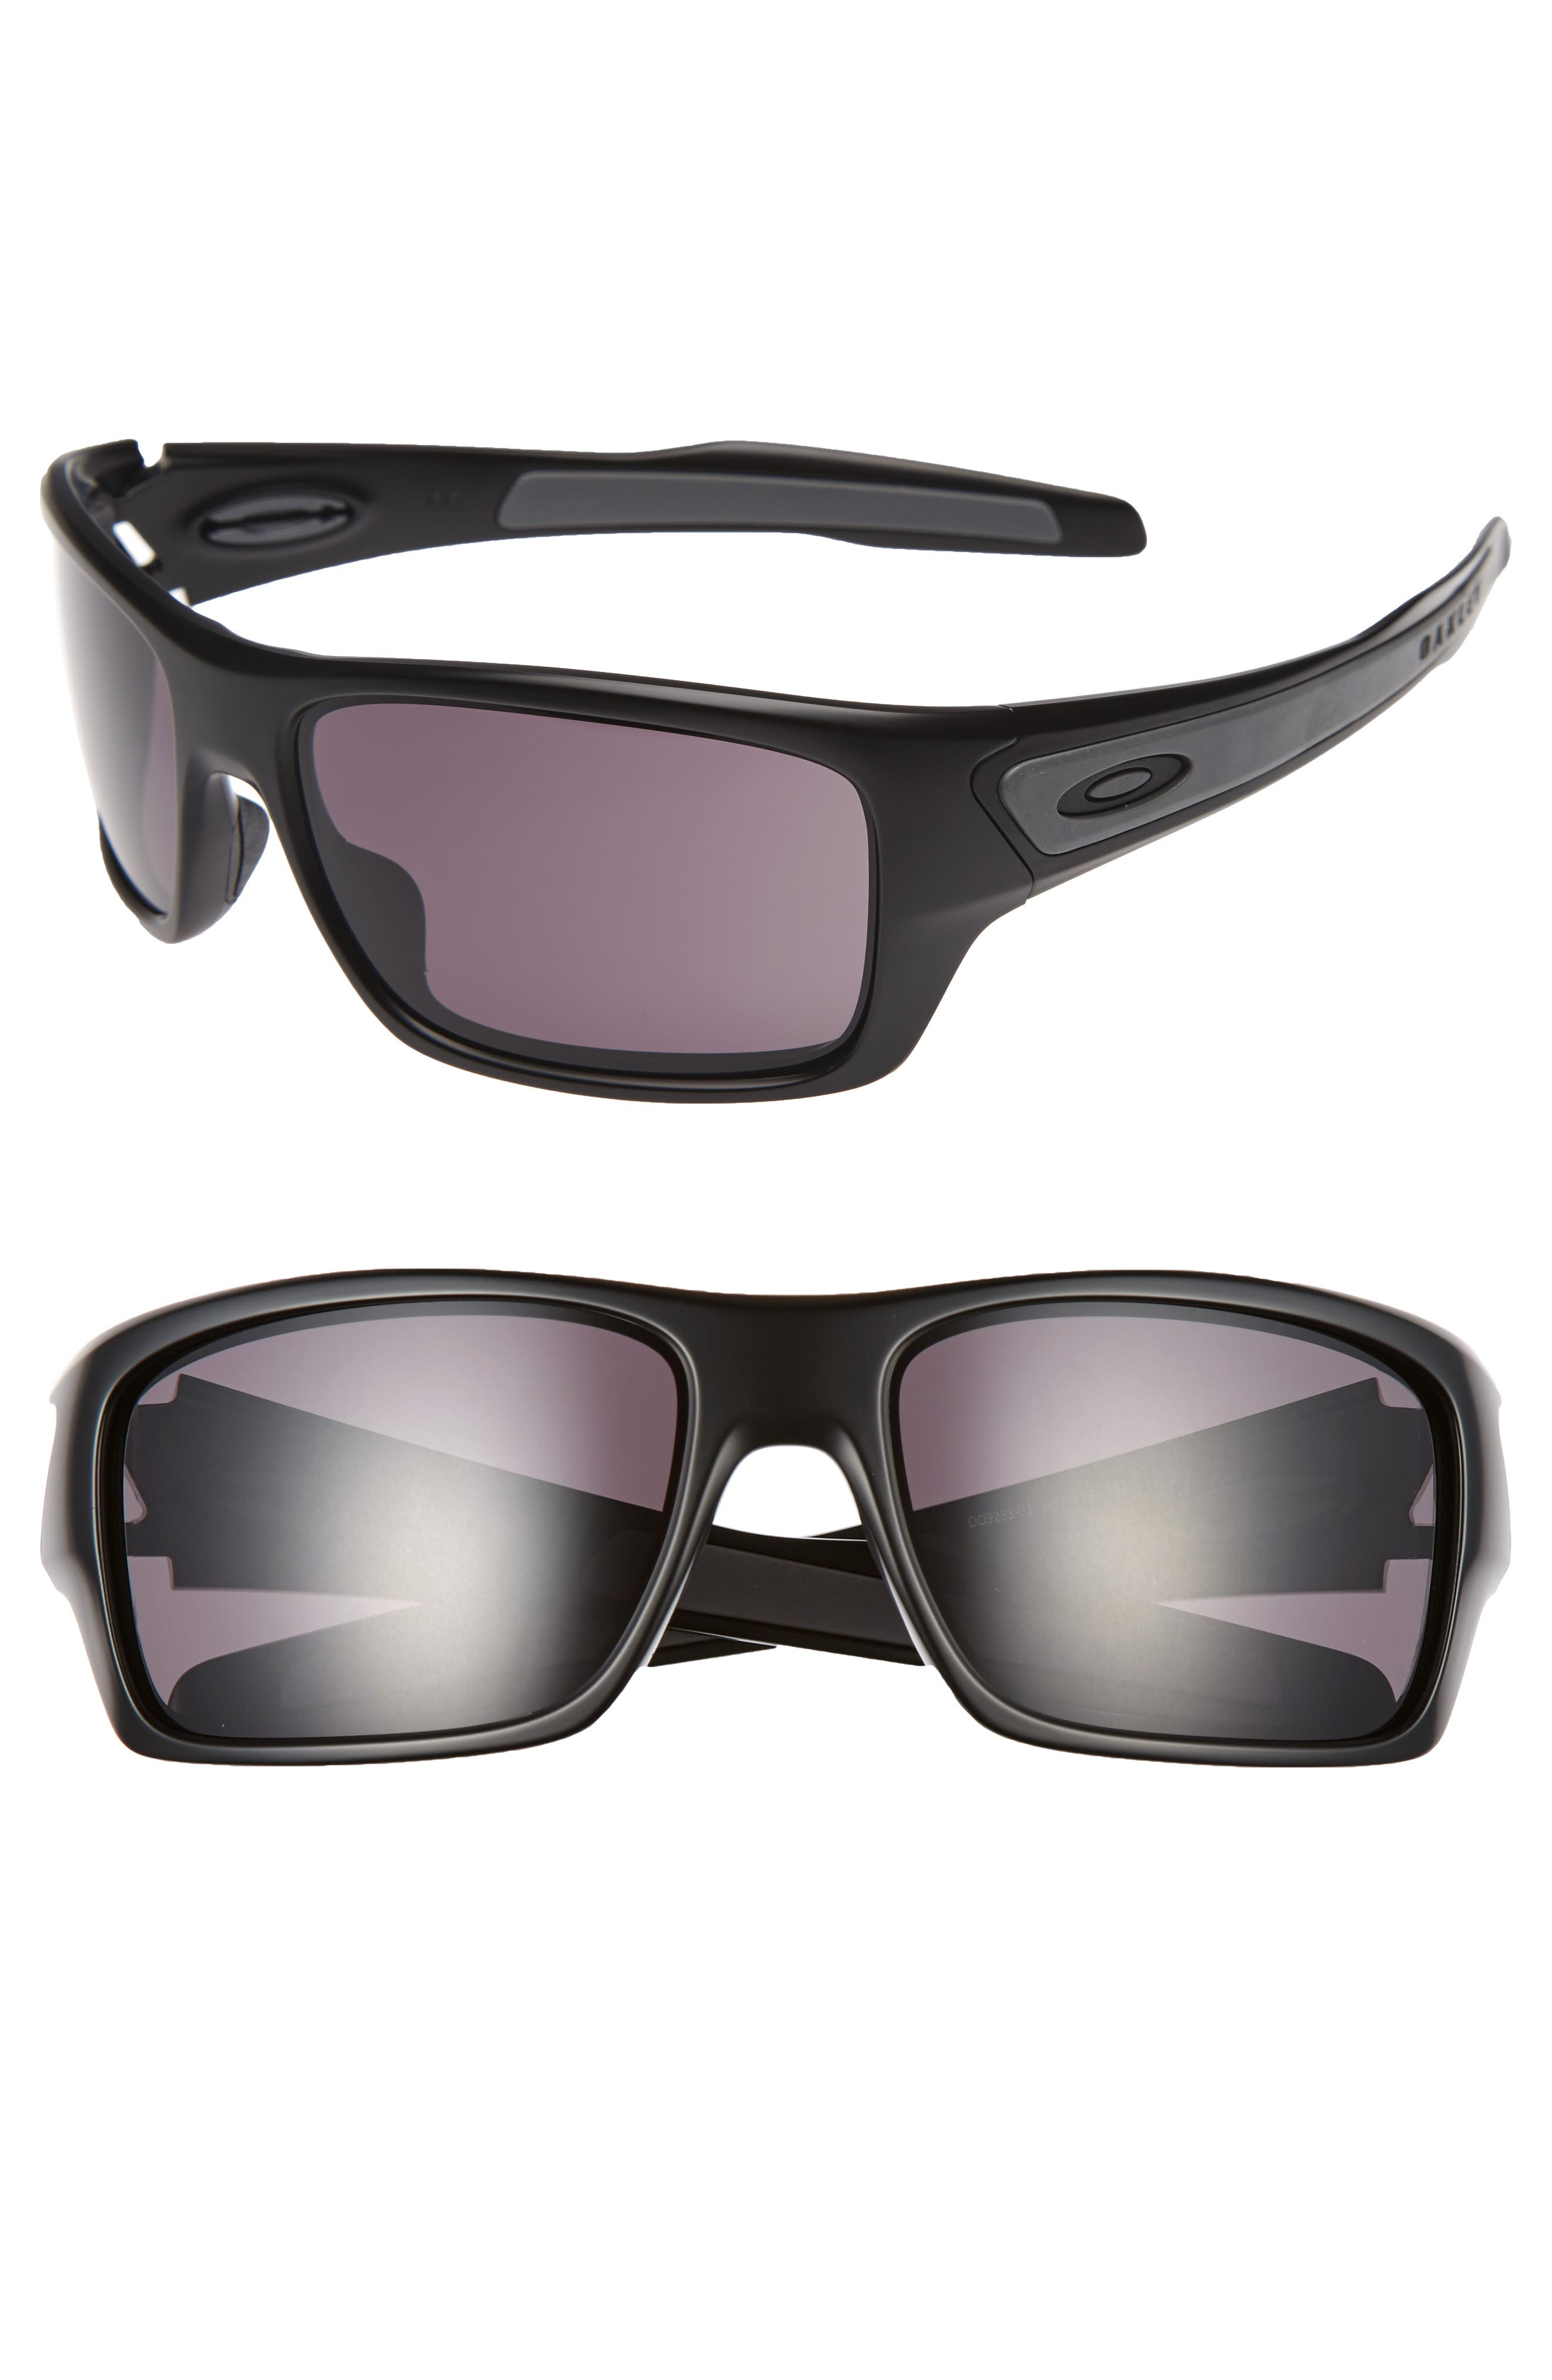 Oakley Turbine 65mm Sunglasses